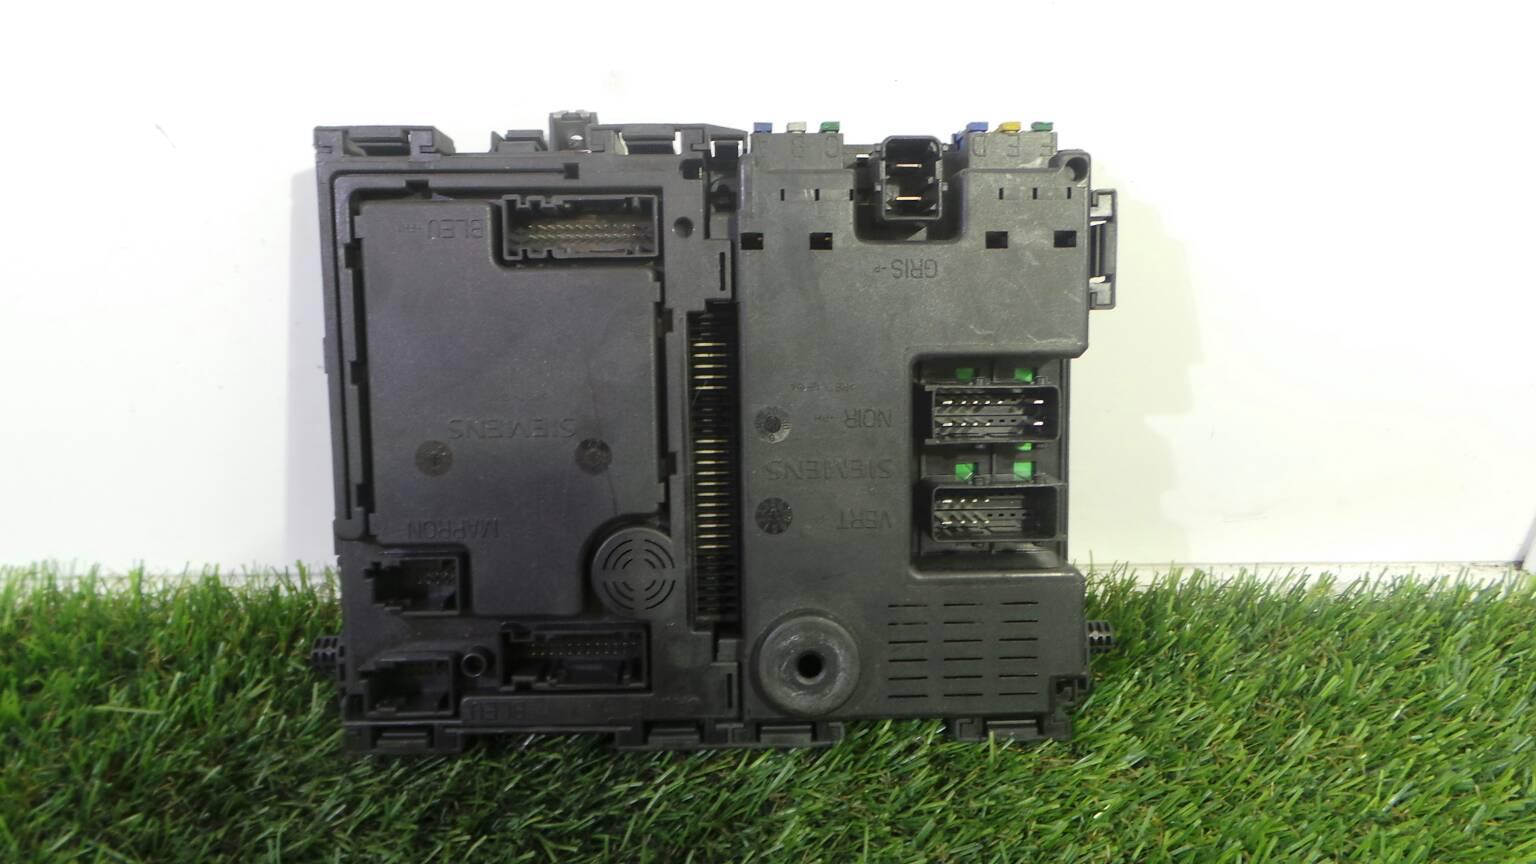 Fuse Box 96 264 60 880 03 PEUGEOT, 206 Hatchback (2A/C)